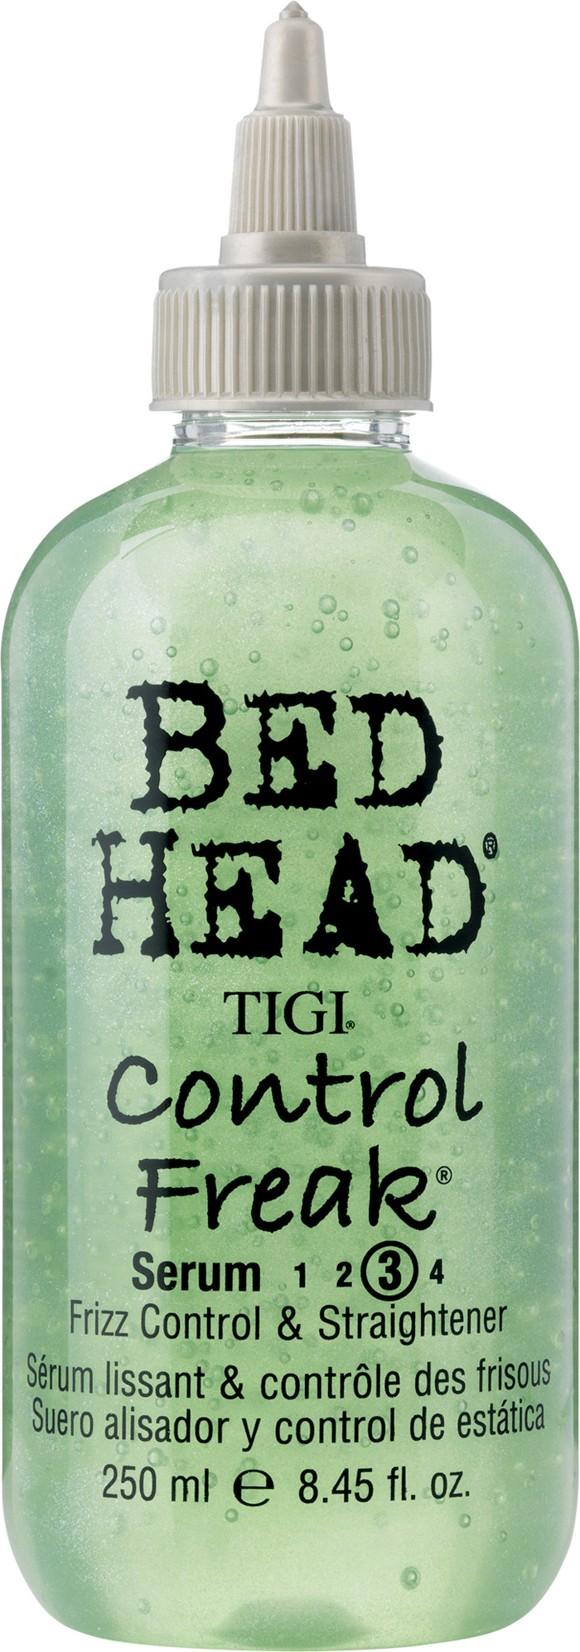 TIGI - Bed Head Frizz Control & Straightener Serum 250 ml